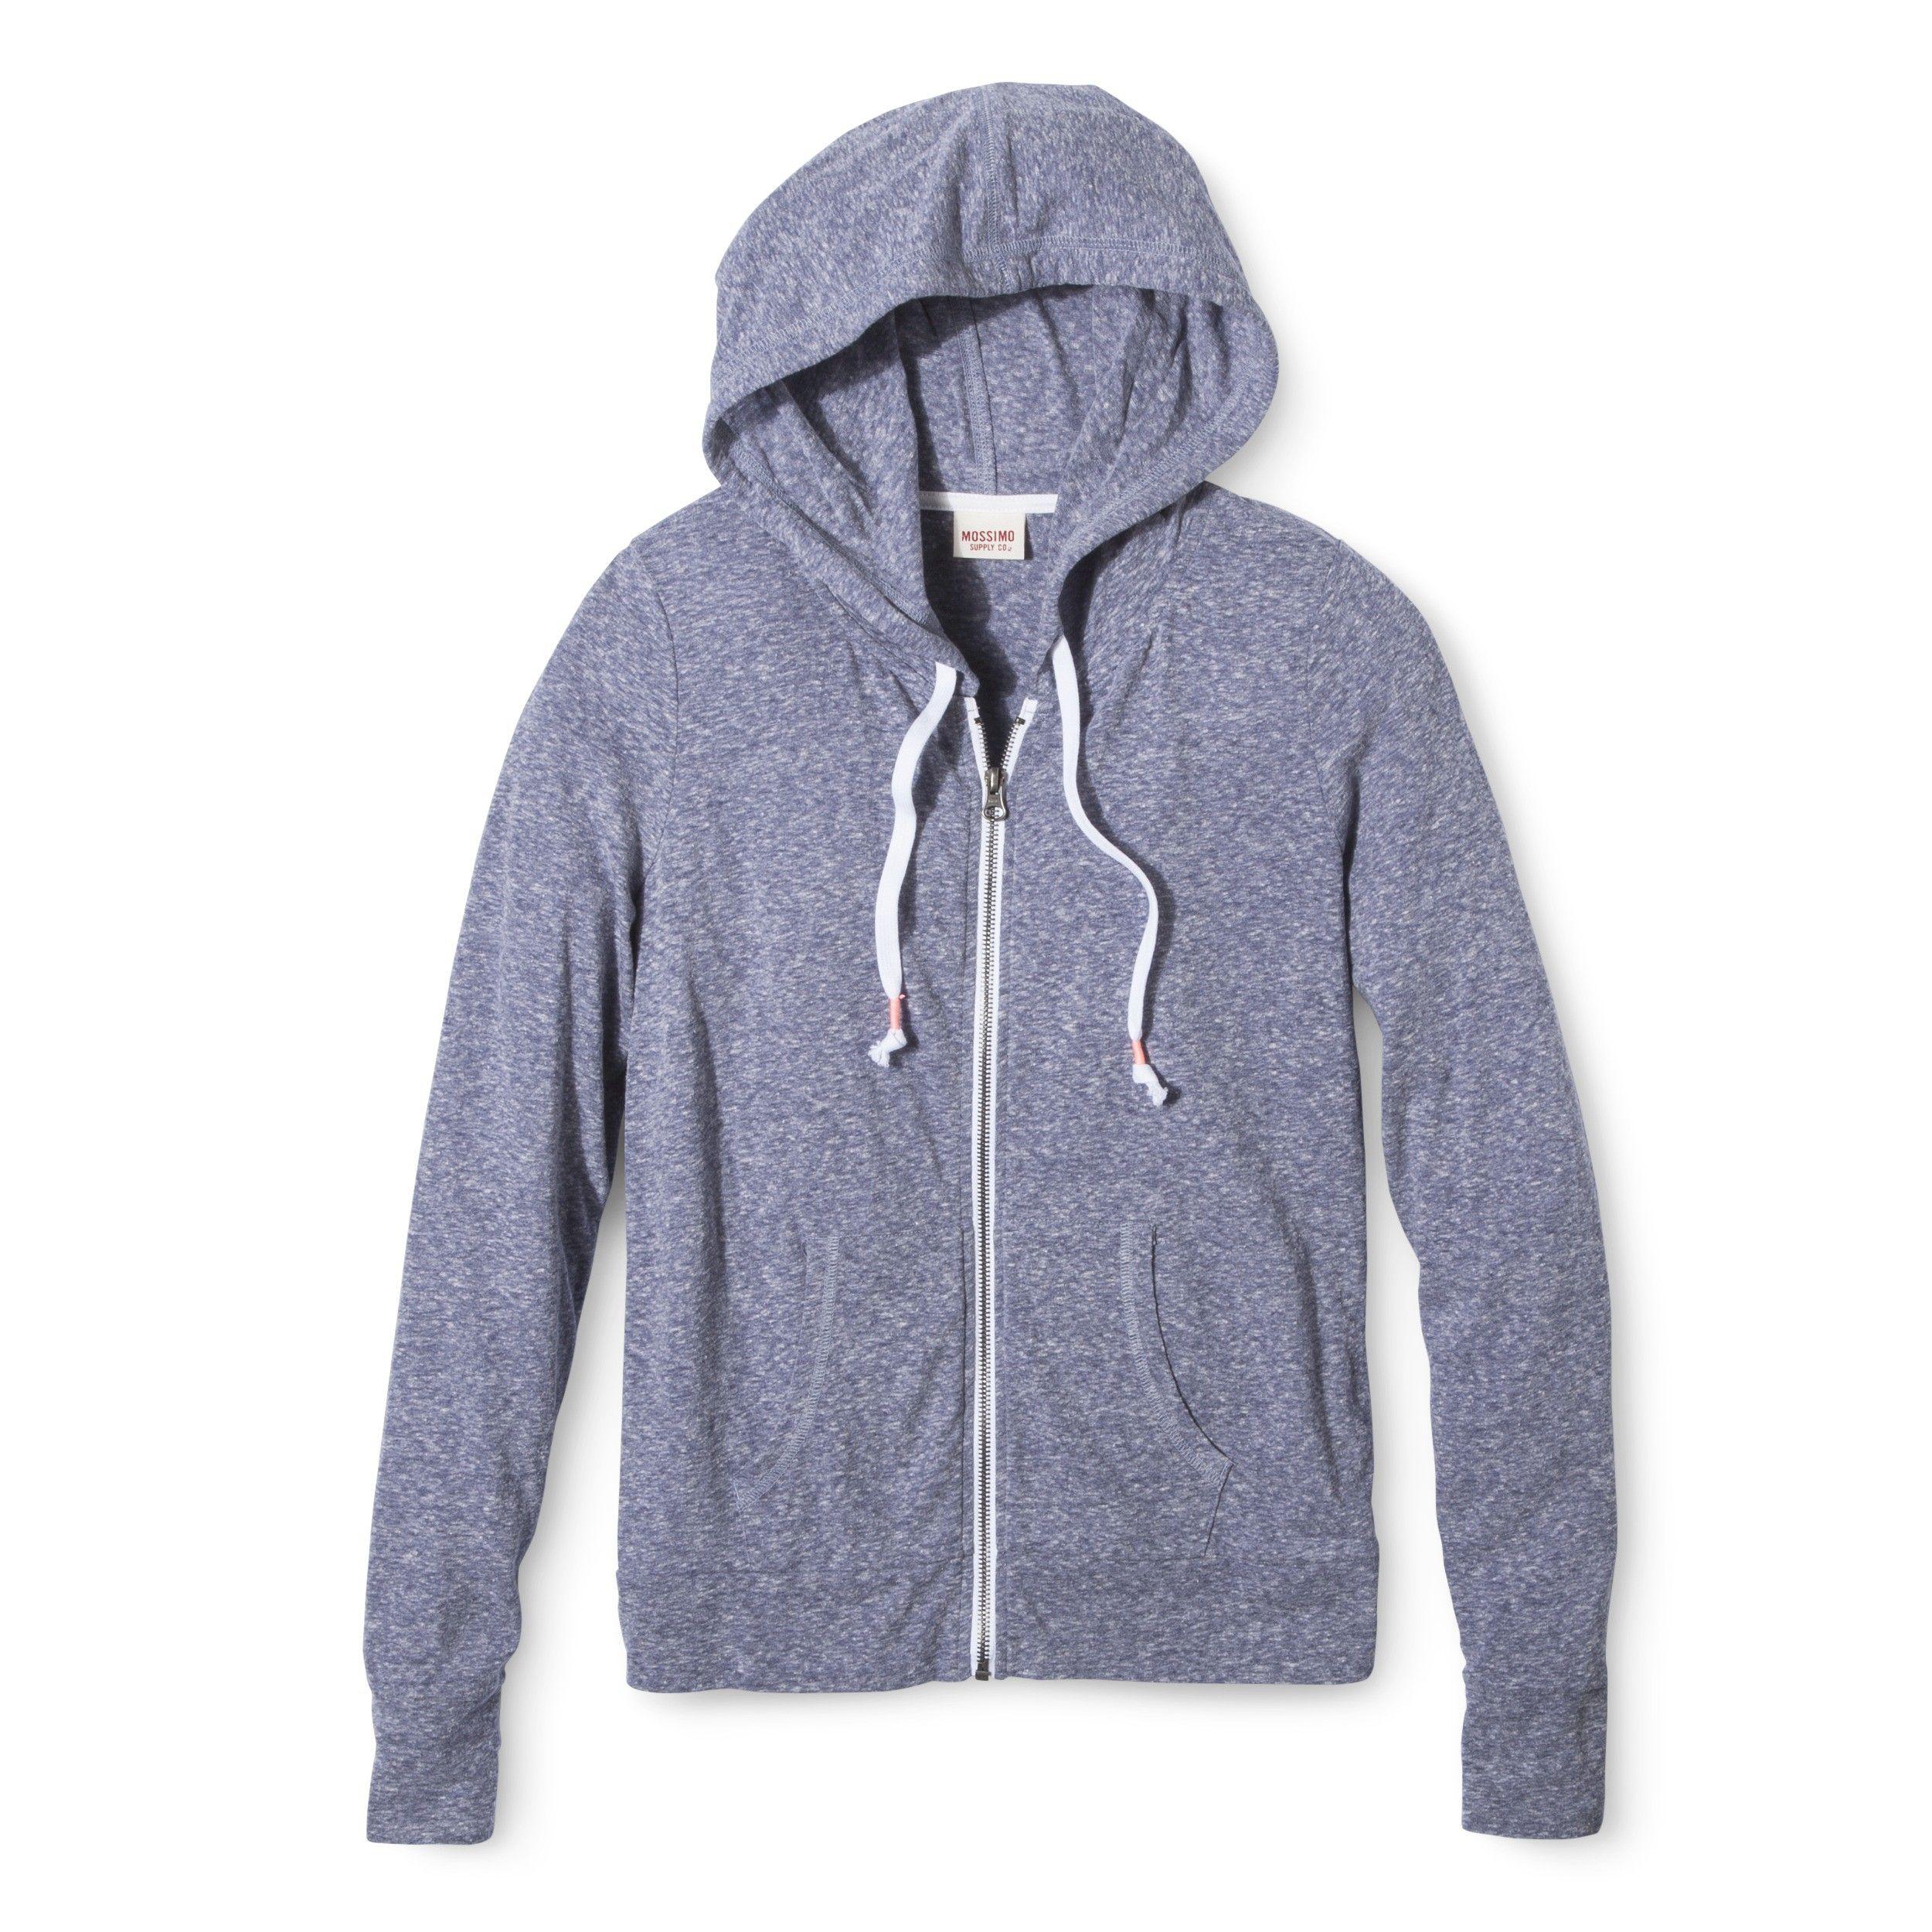 73d2718220cdbf Mossimo Supply Co. Junior's Lightweight Hoodie -... : Target ...